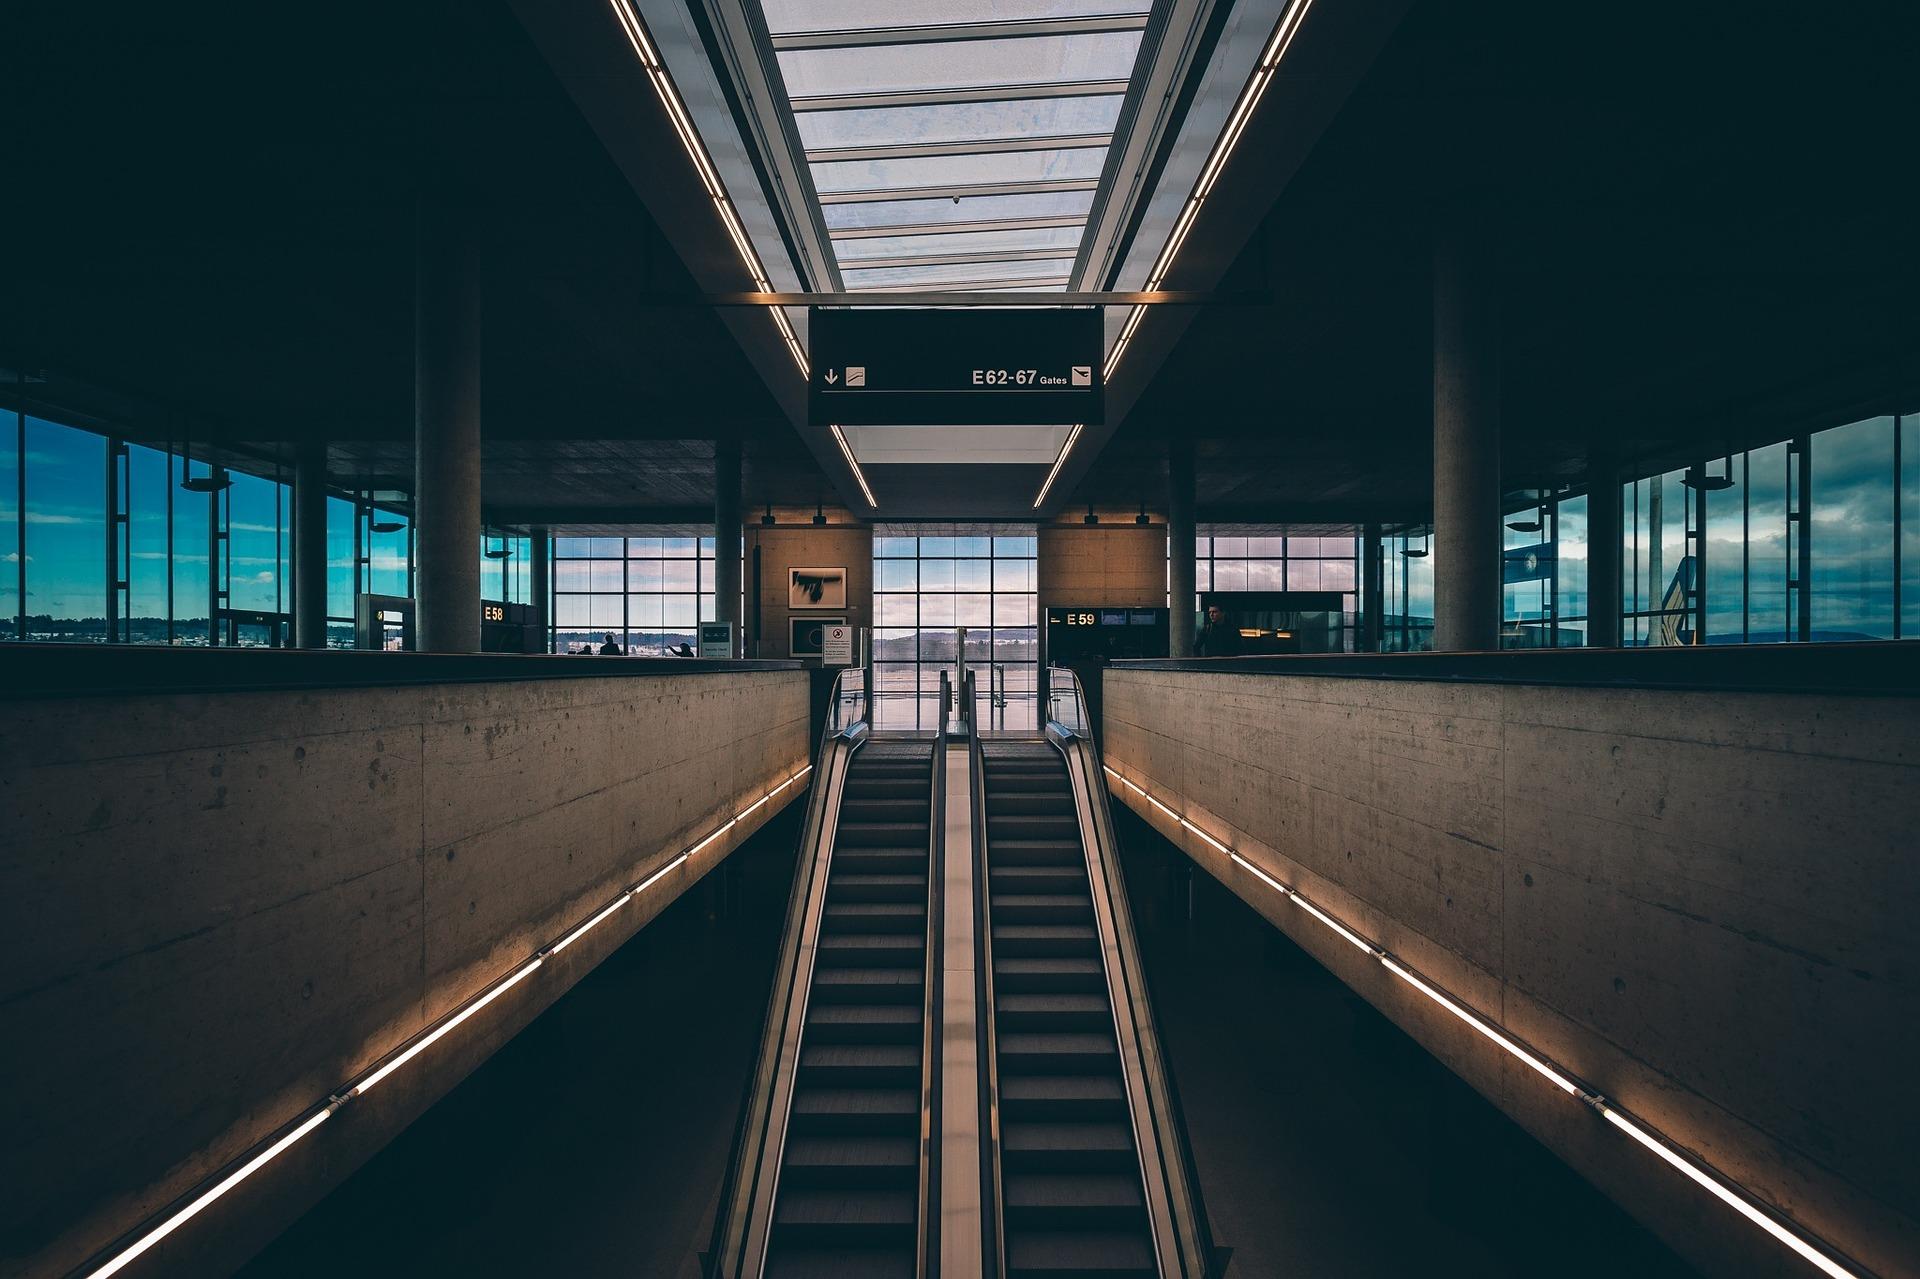 Un aéroport en temps de covid-19